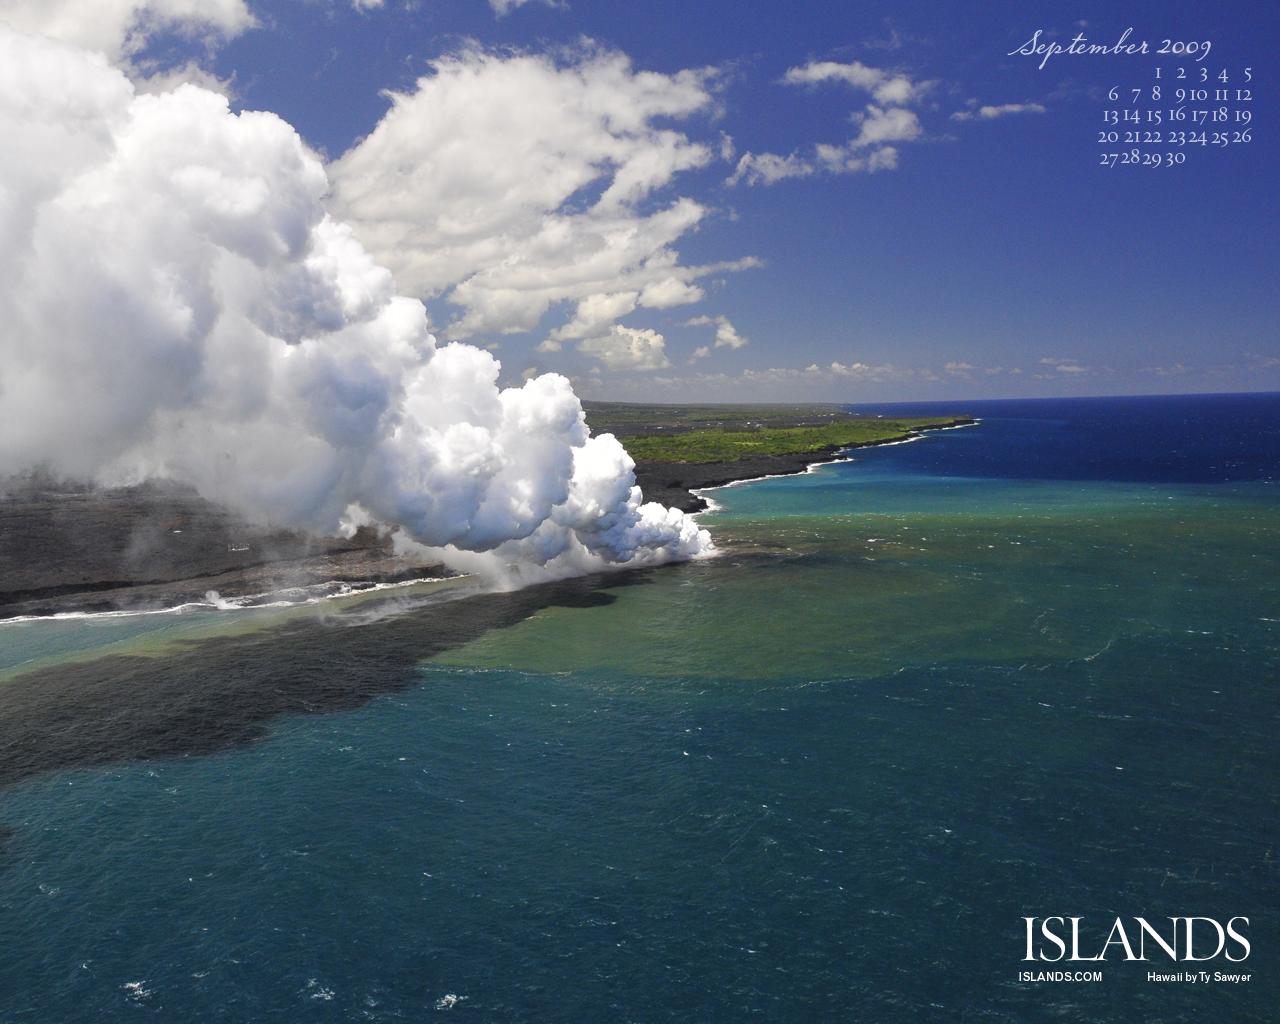 Jawad Name Wallpaper Hd Cayman Islands Wallpapers Hd Wallpapers Pulse